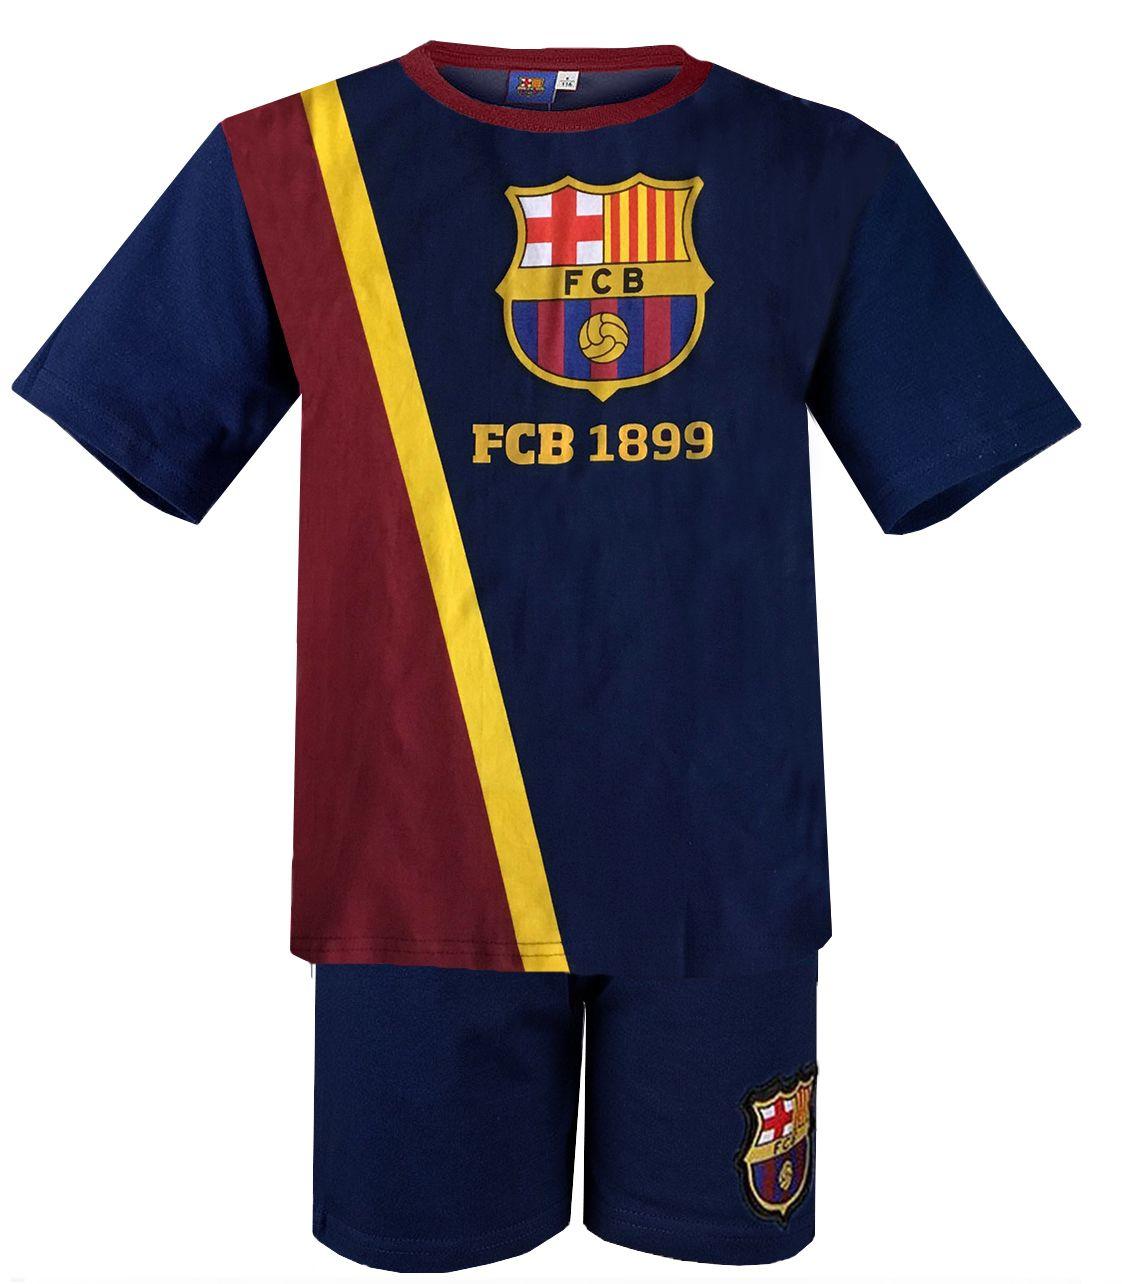 af6b71525df FC Barcelona short pyjamas #fcbarcelona #pyjamas | Kids Clothing ...